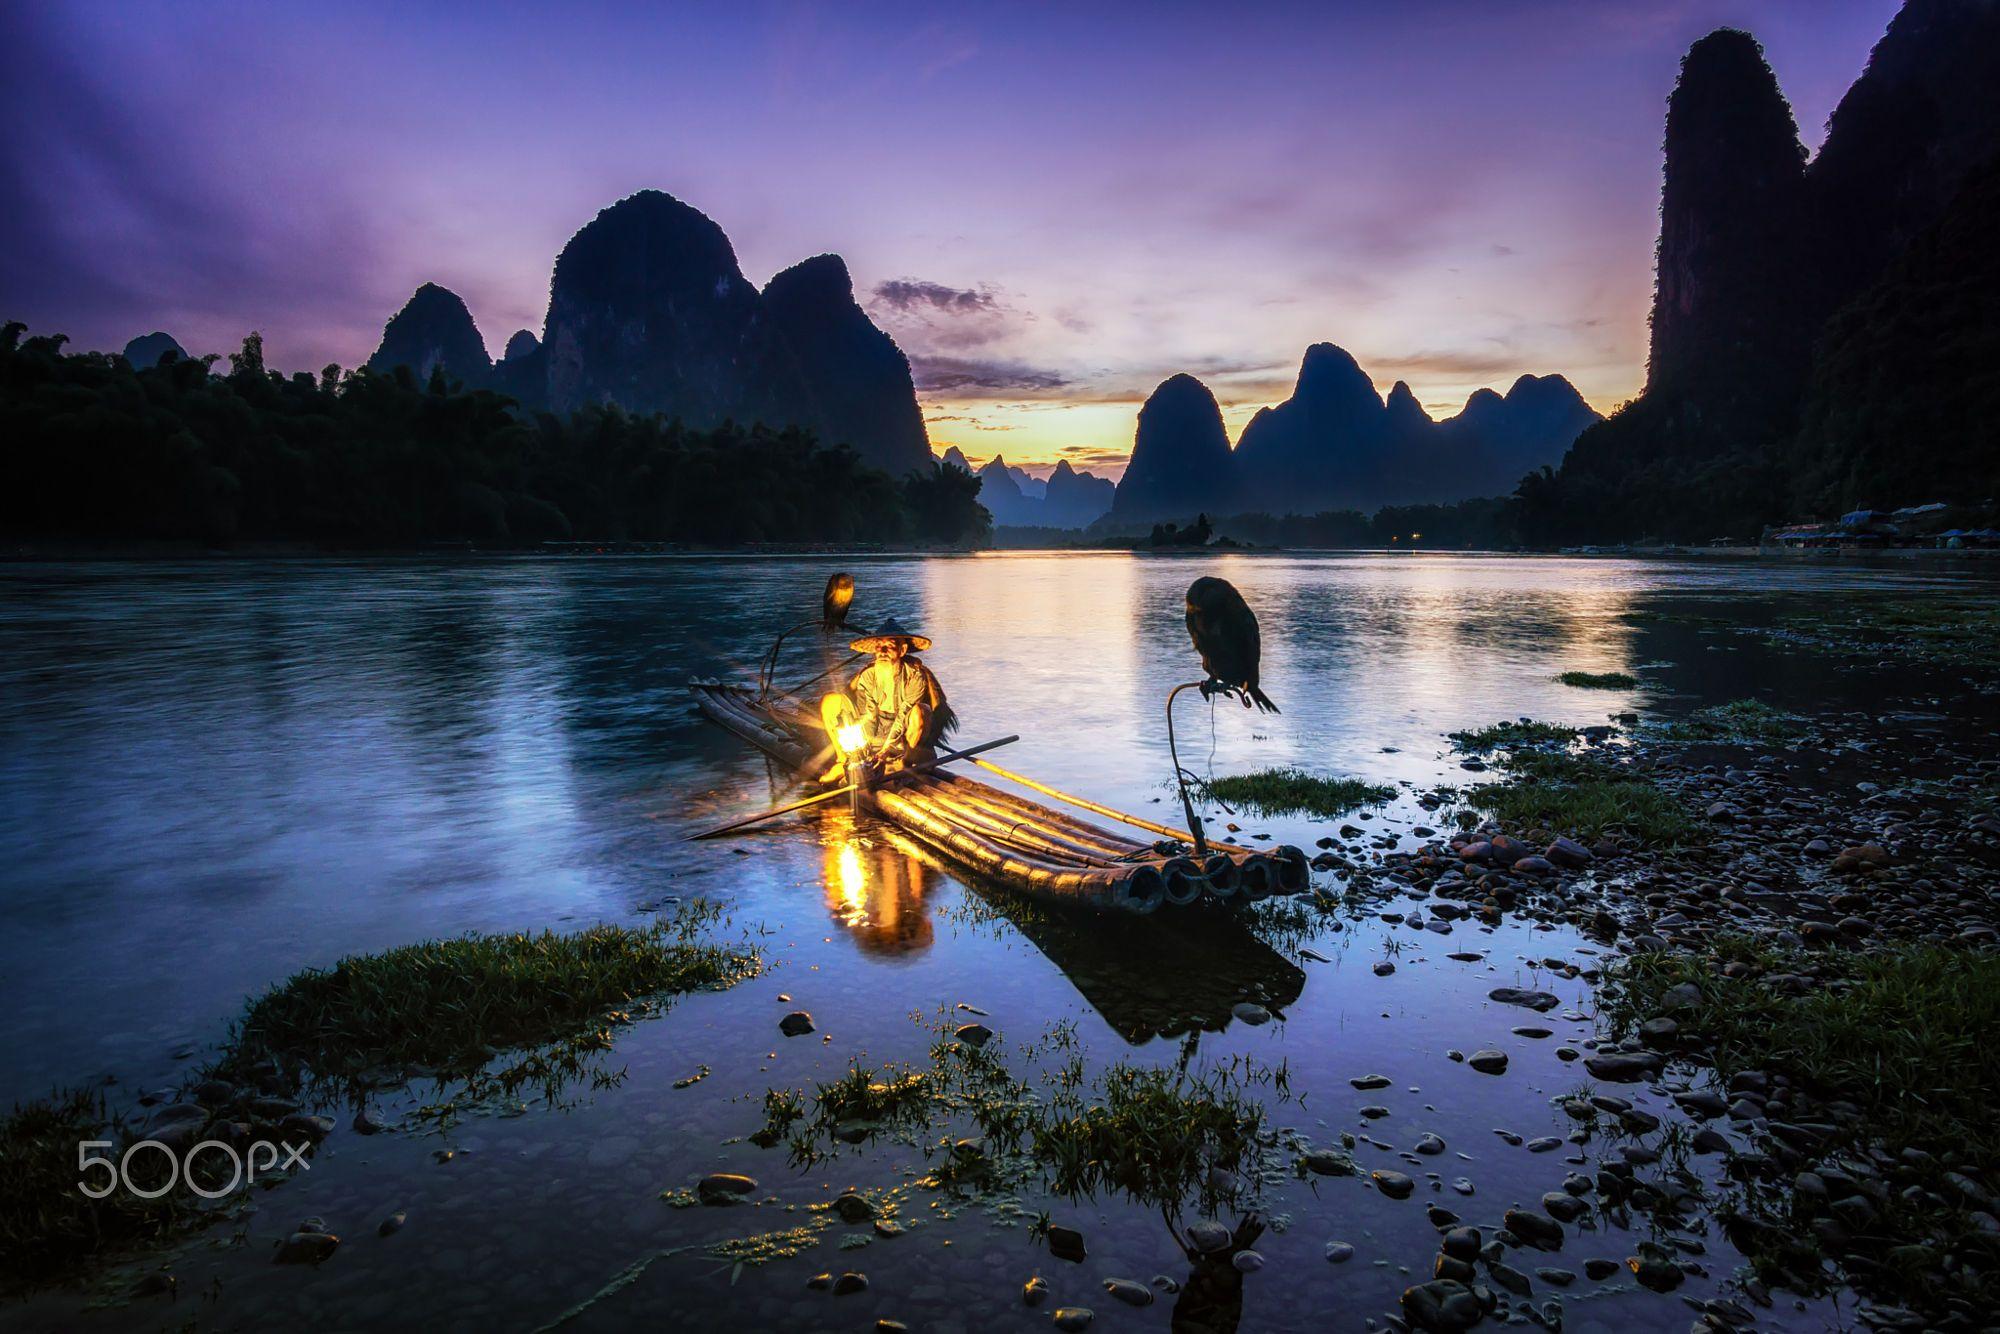 [6000 x 4000] The cormorant fisherman in the li river xingping china. Taken during sunset hours.